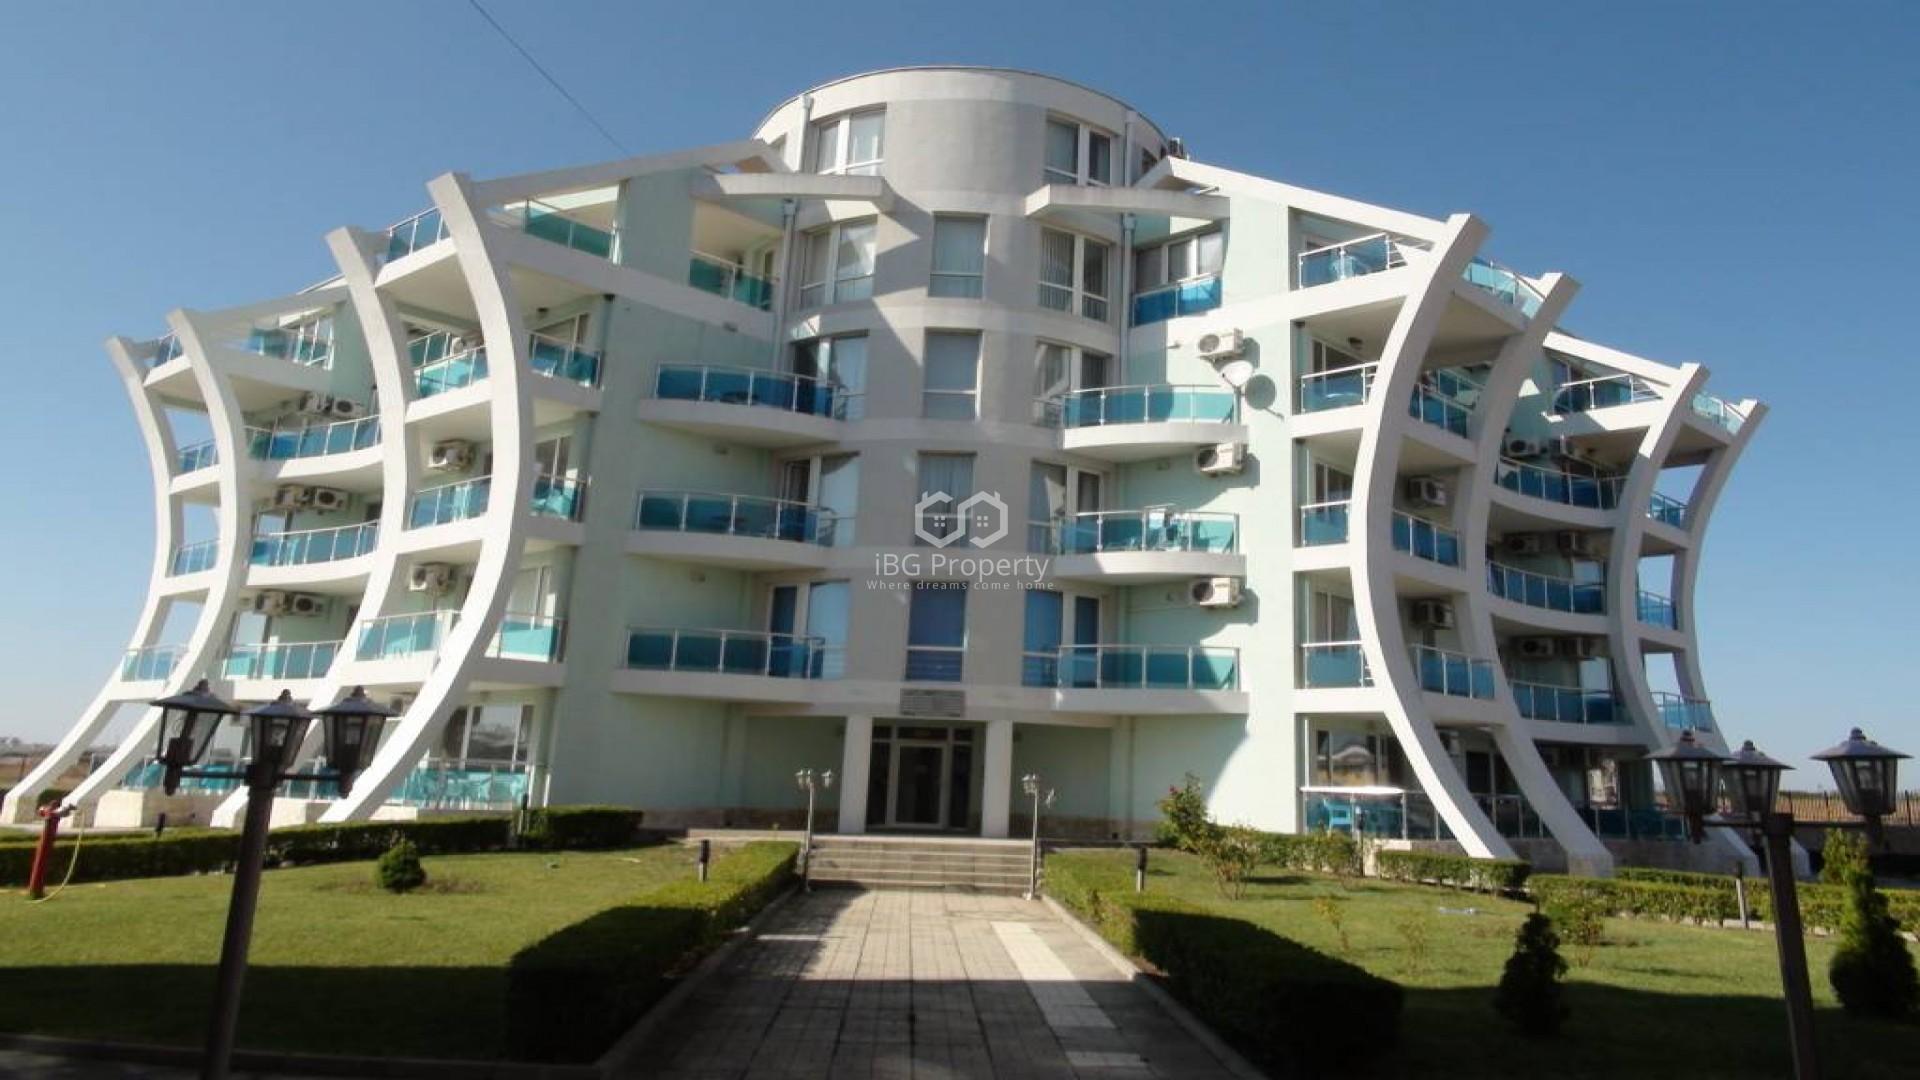 Однокомнатная квартира Ахелой 36 m2